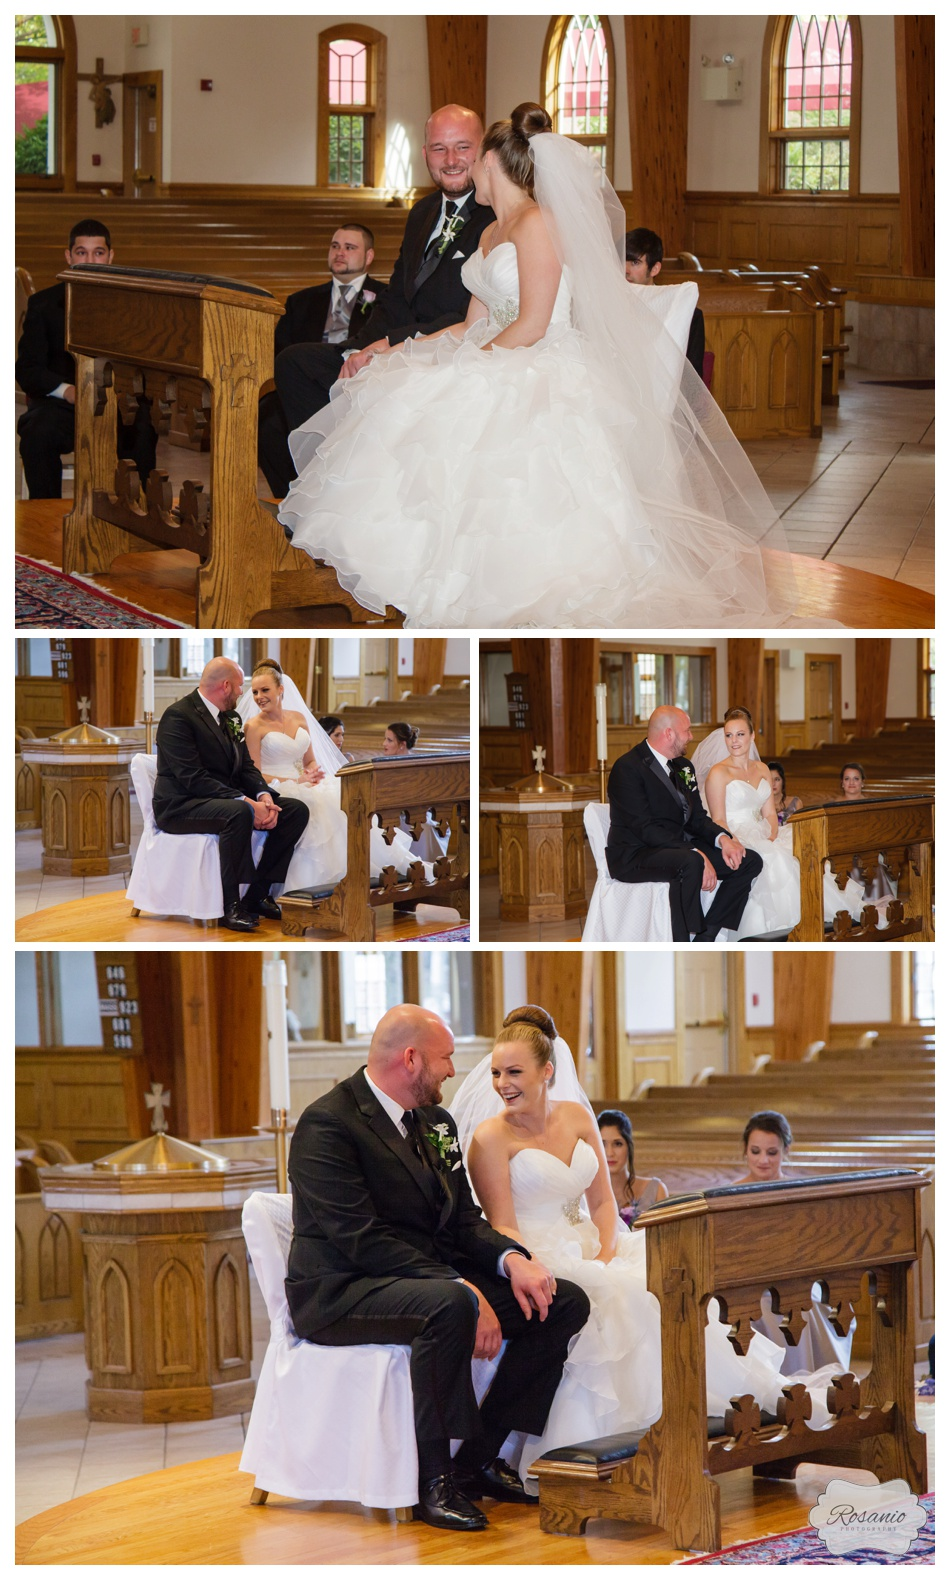 Rosanio Photography | Diburro's Haverhill MA | Massachusetts Wedding Photographer_0042.jpg